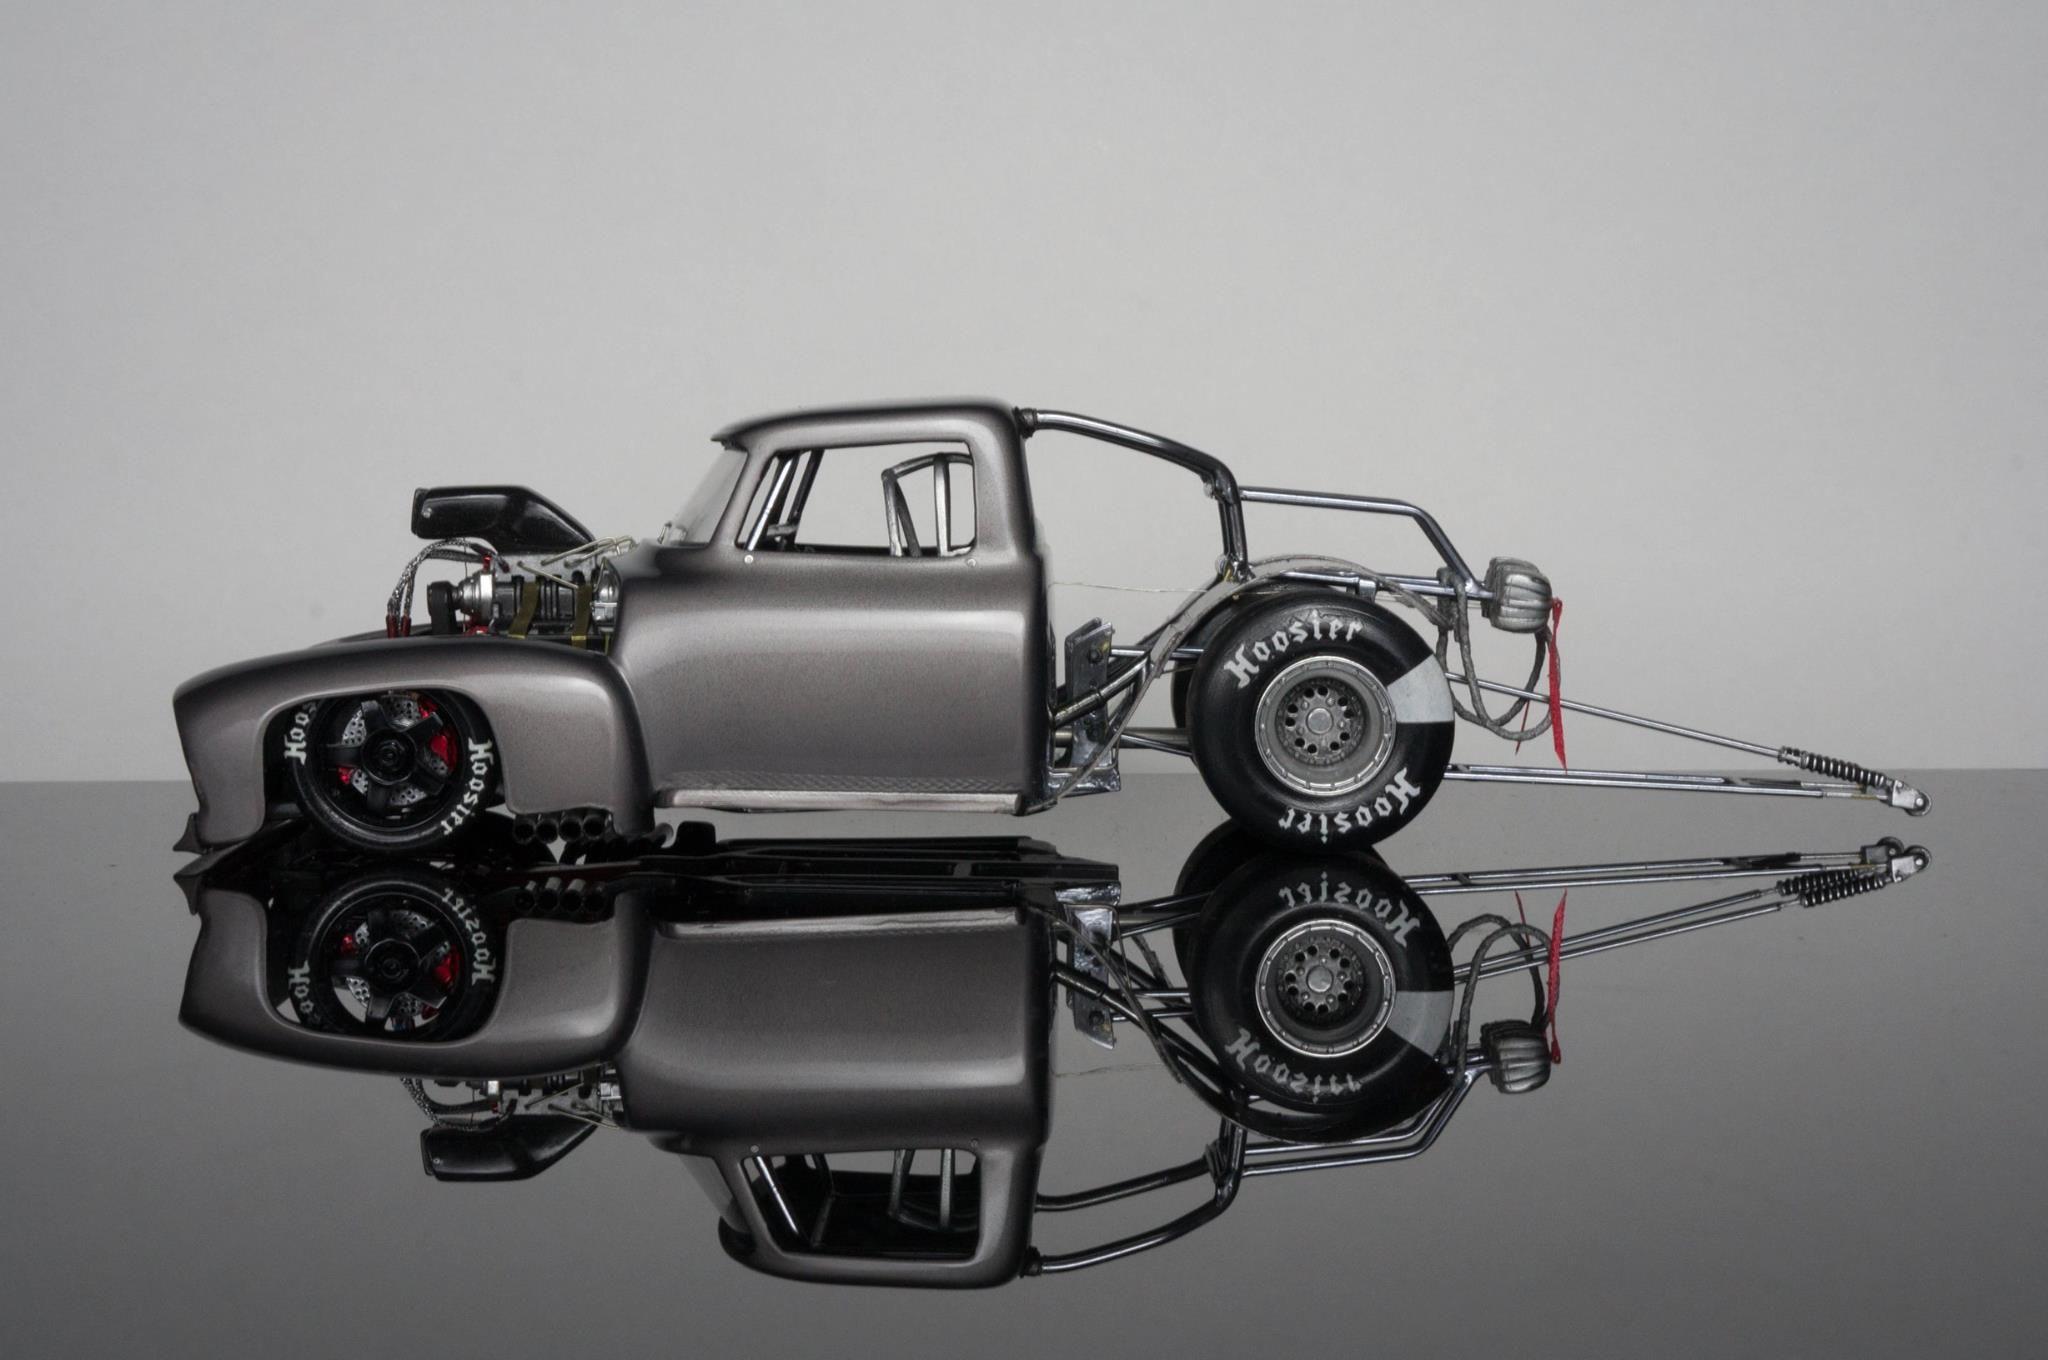 Amazing Drag Truck Model Plastic Model Cars Car Model Concept Cars